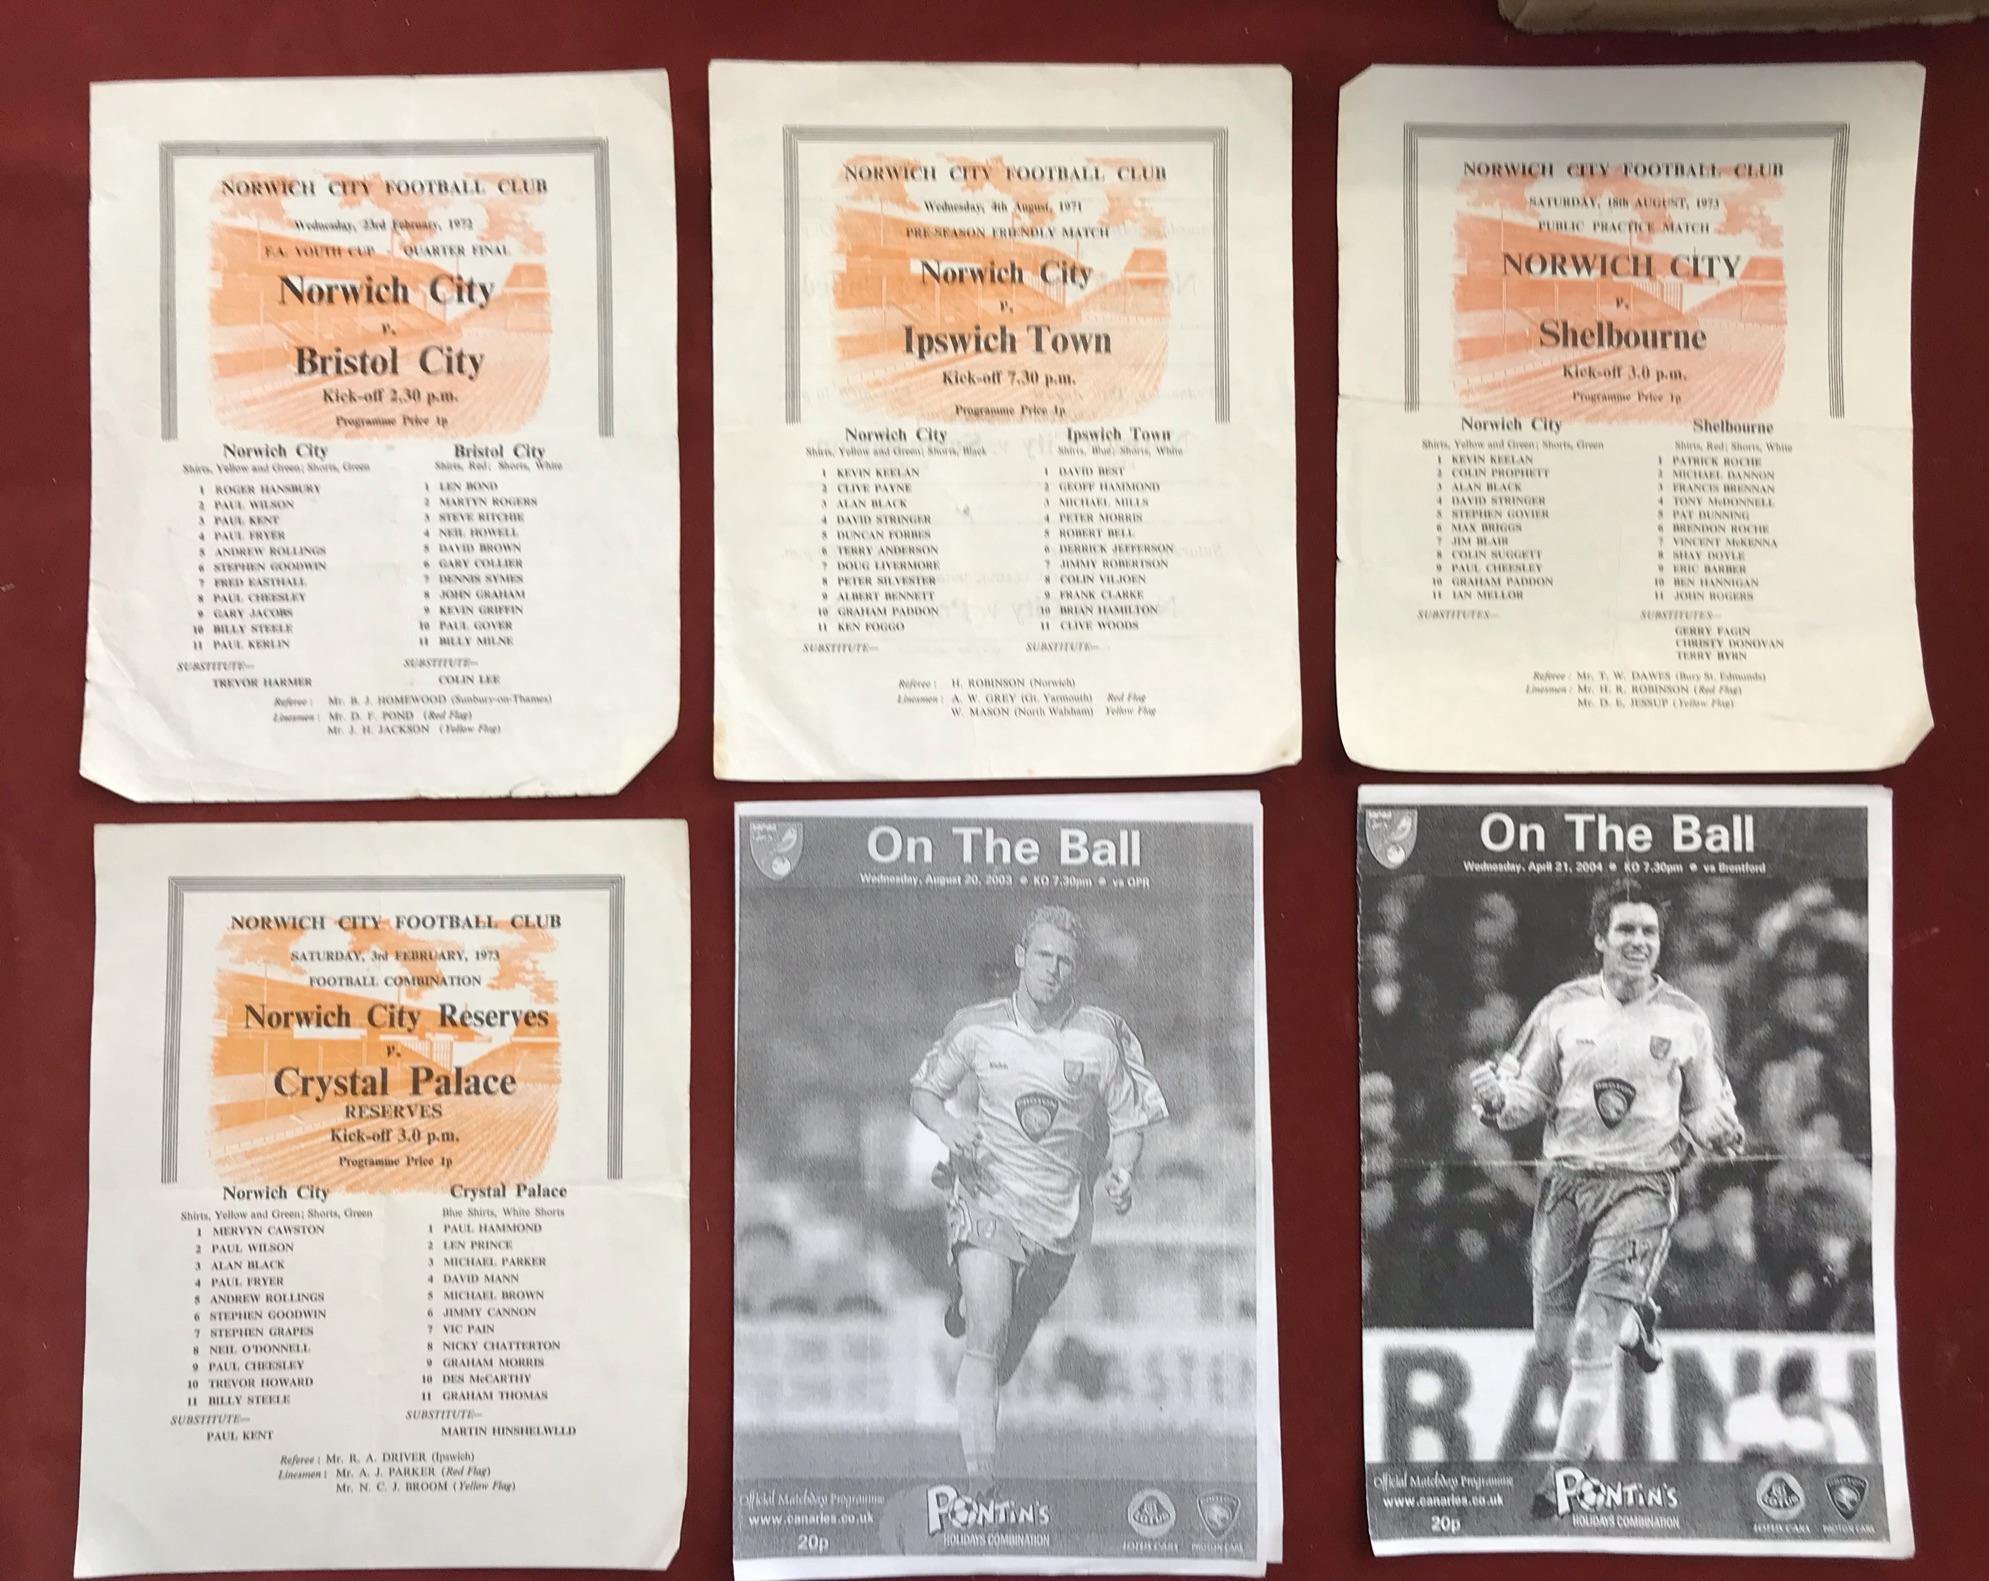 Norwich City Reserves 1971-73 - Chelsea Reserves 9 Dec 1972. Chelsea Reserves v Arsenal Reserves - Image 3 of 4